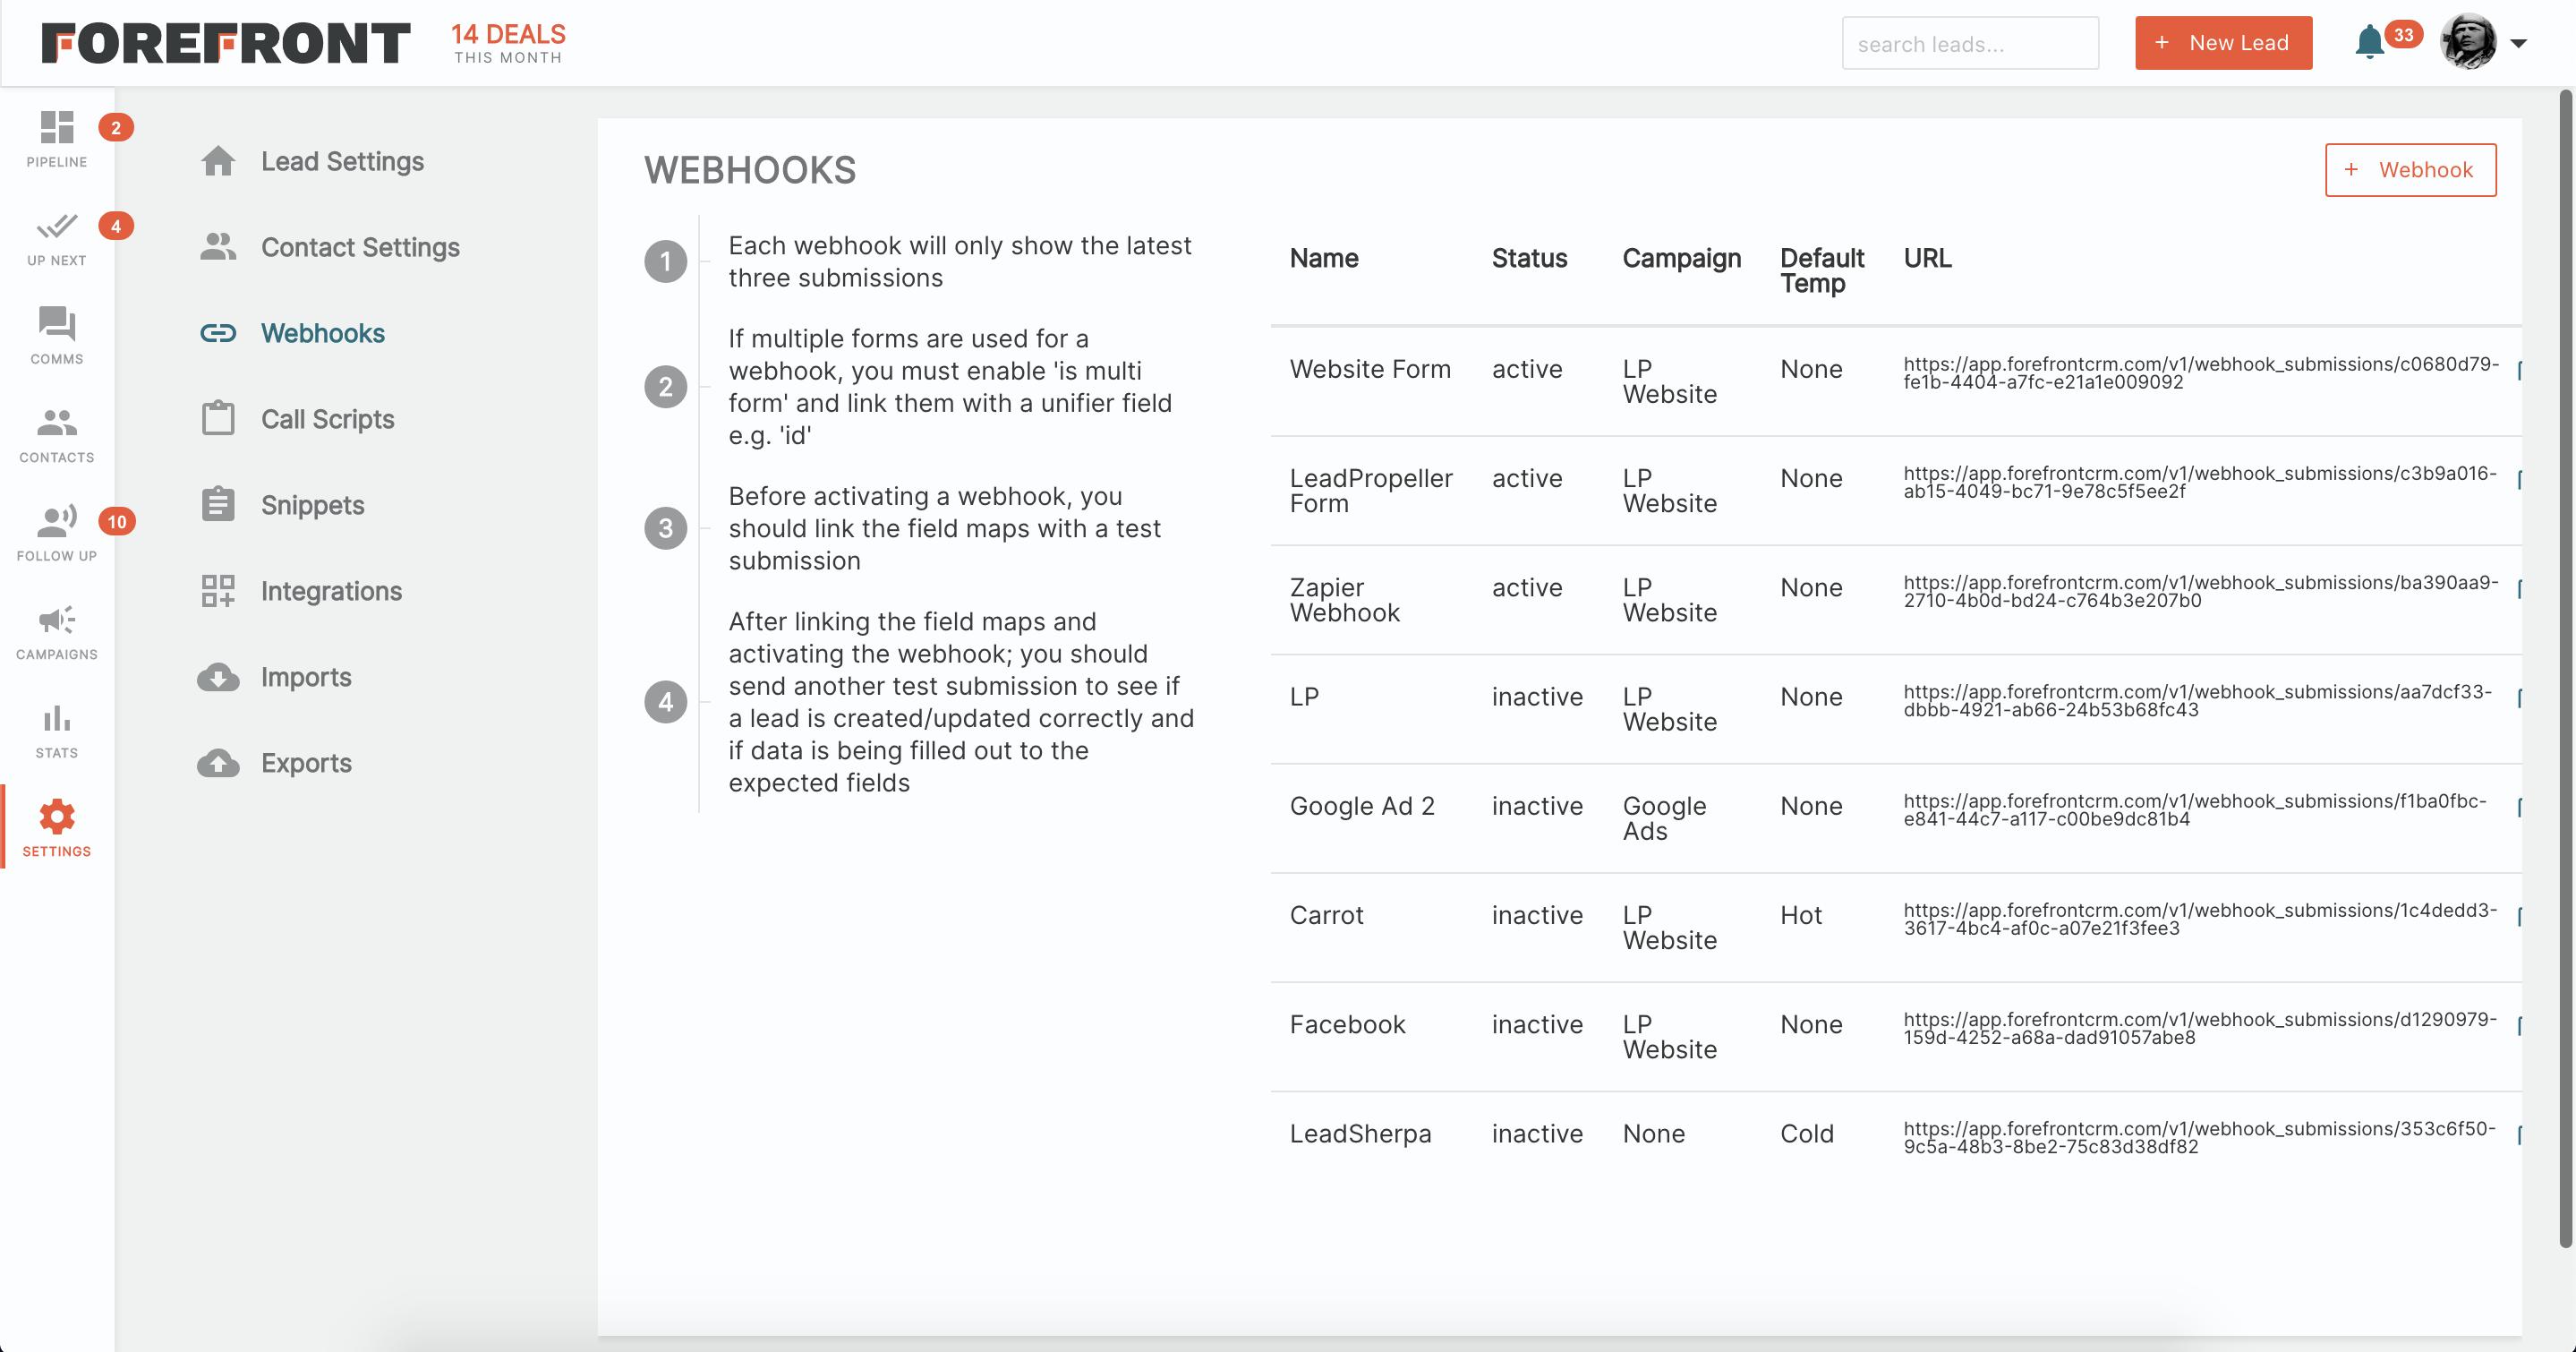 Forefront CRM Webhooks